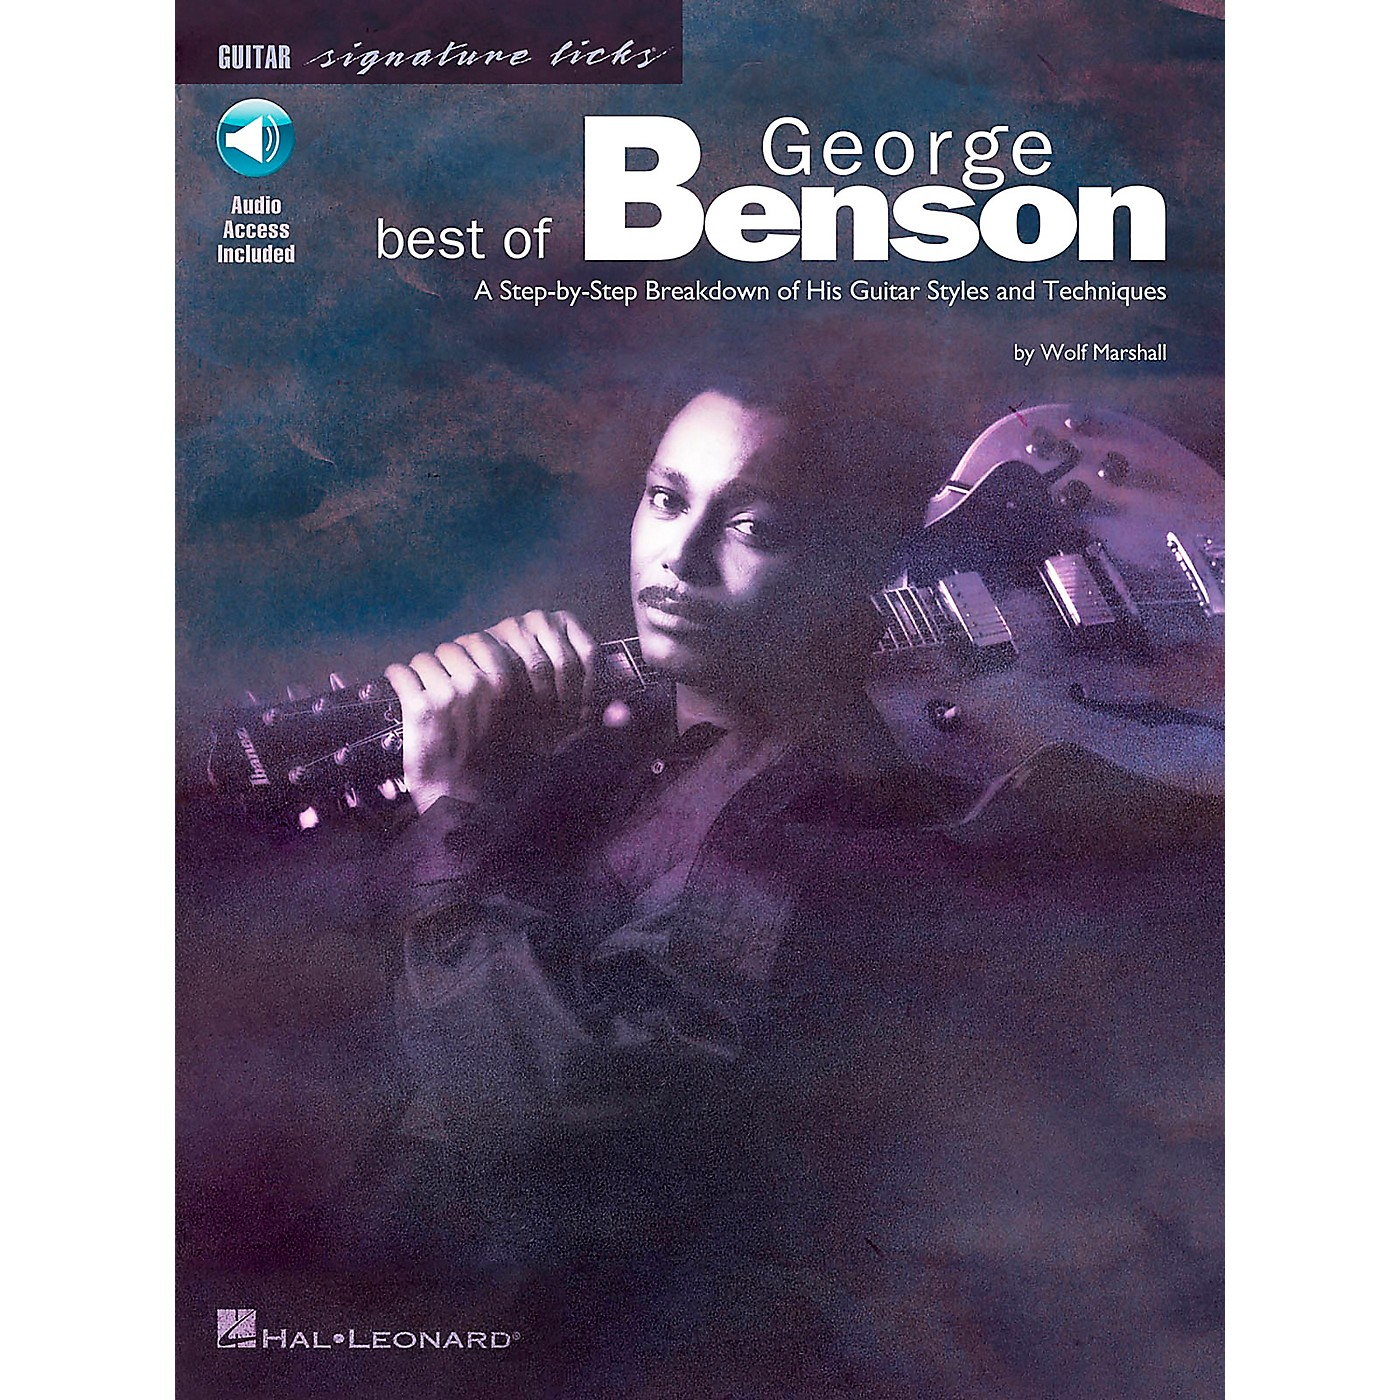 Hal Leonard Best of George Benson Signature Licks Book with CD thumbnail